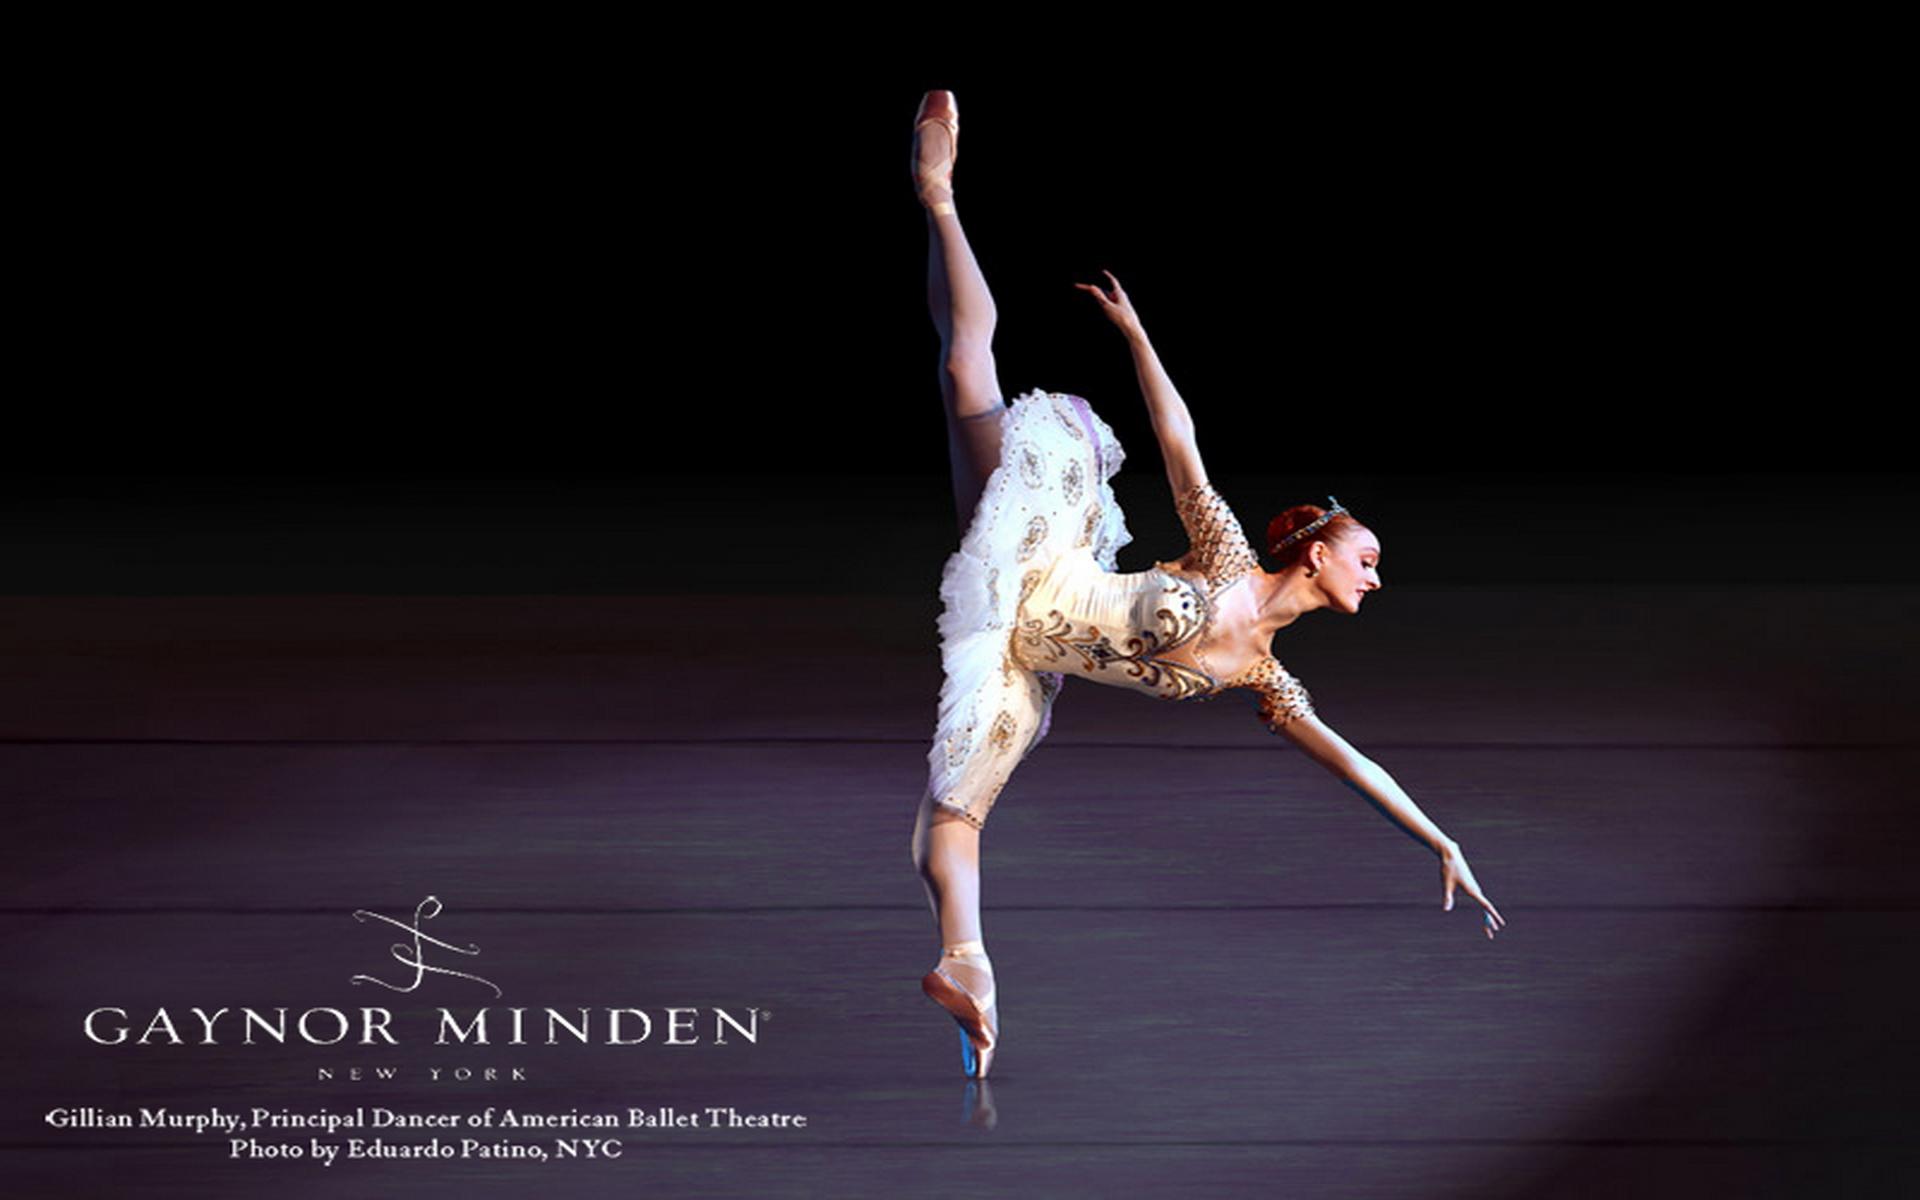 Ballet Dance Wallpapers Hd Resolution Dodskypict: Images For Wallpaper